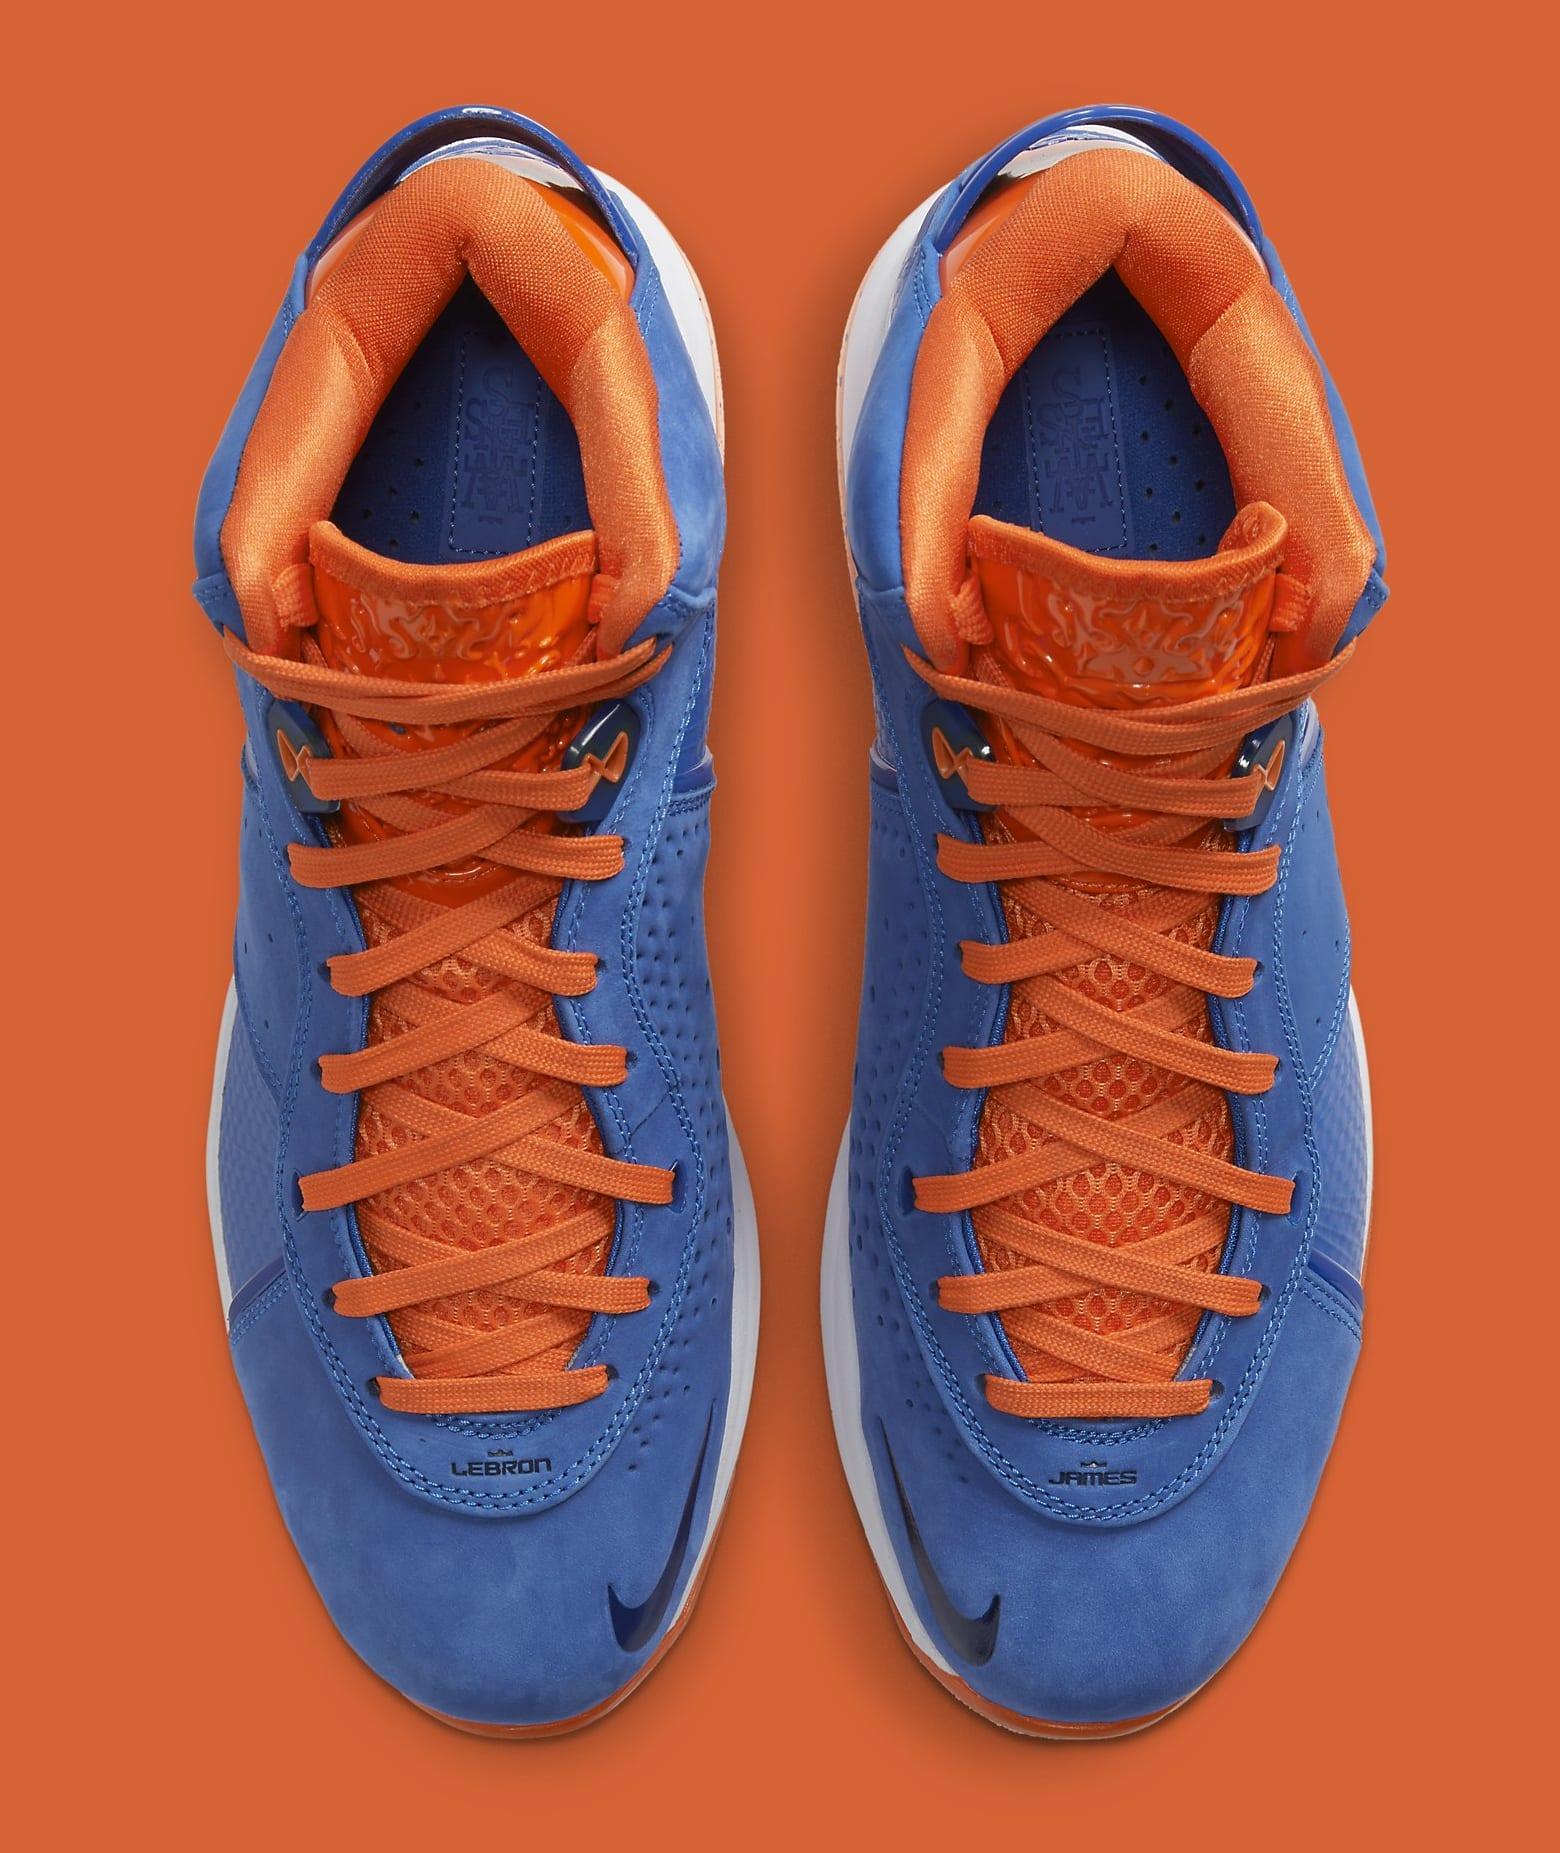 Nike LeBron 8 'HWC' CV1750-400 Top